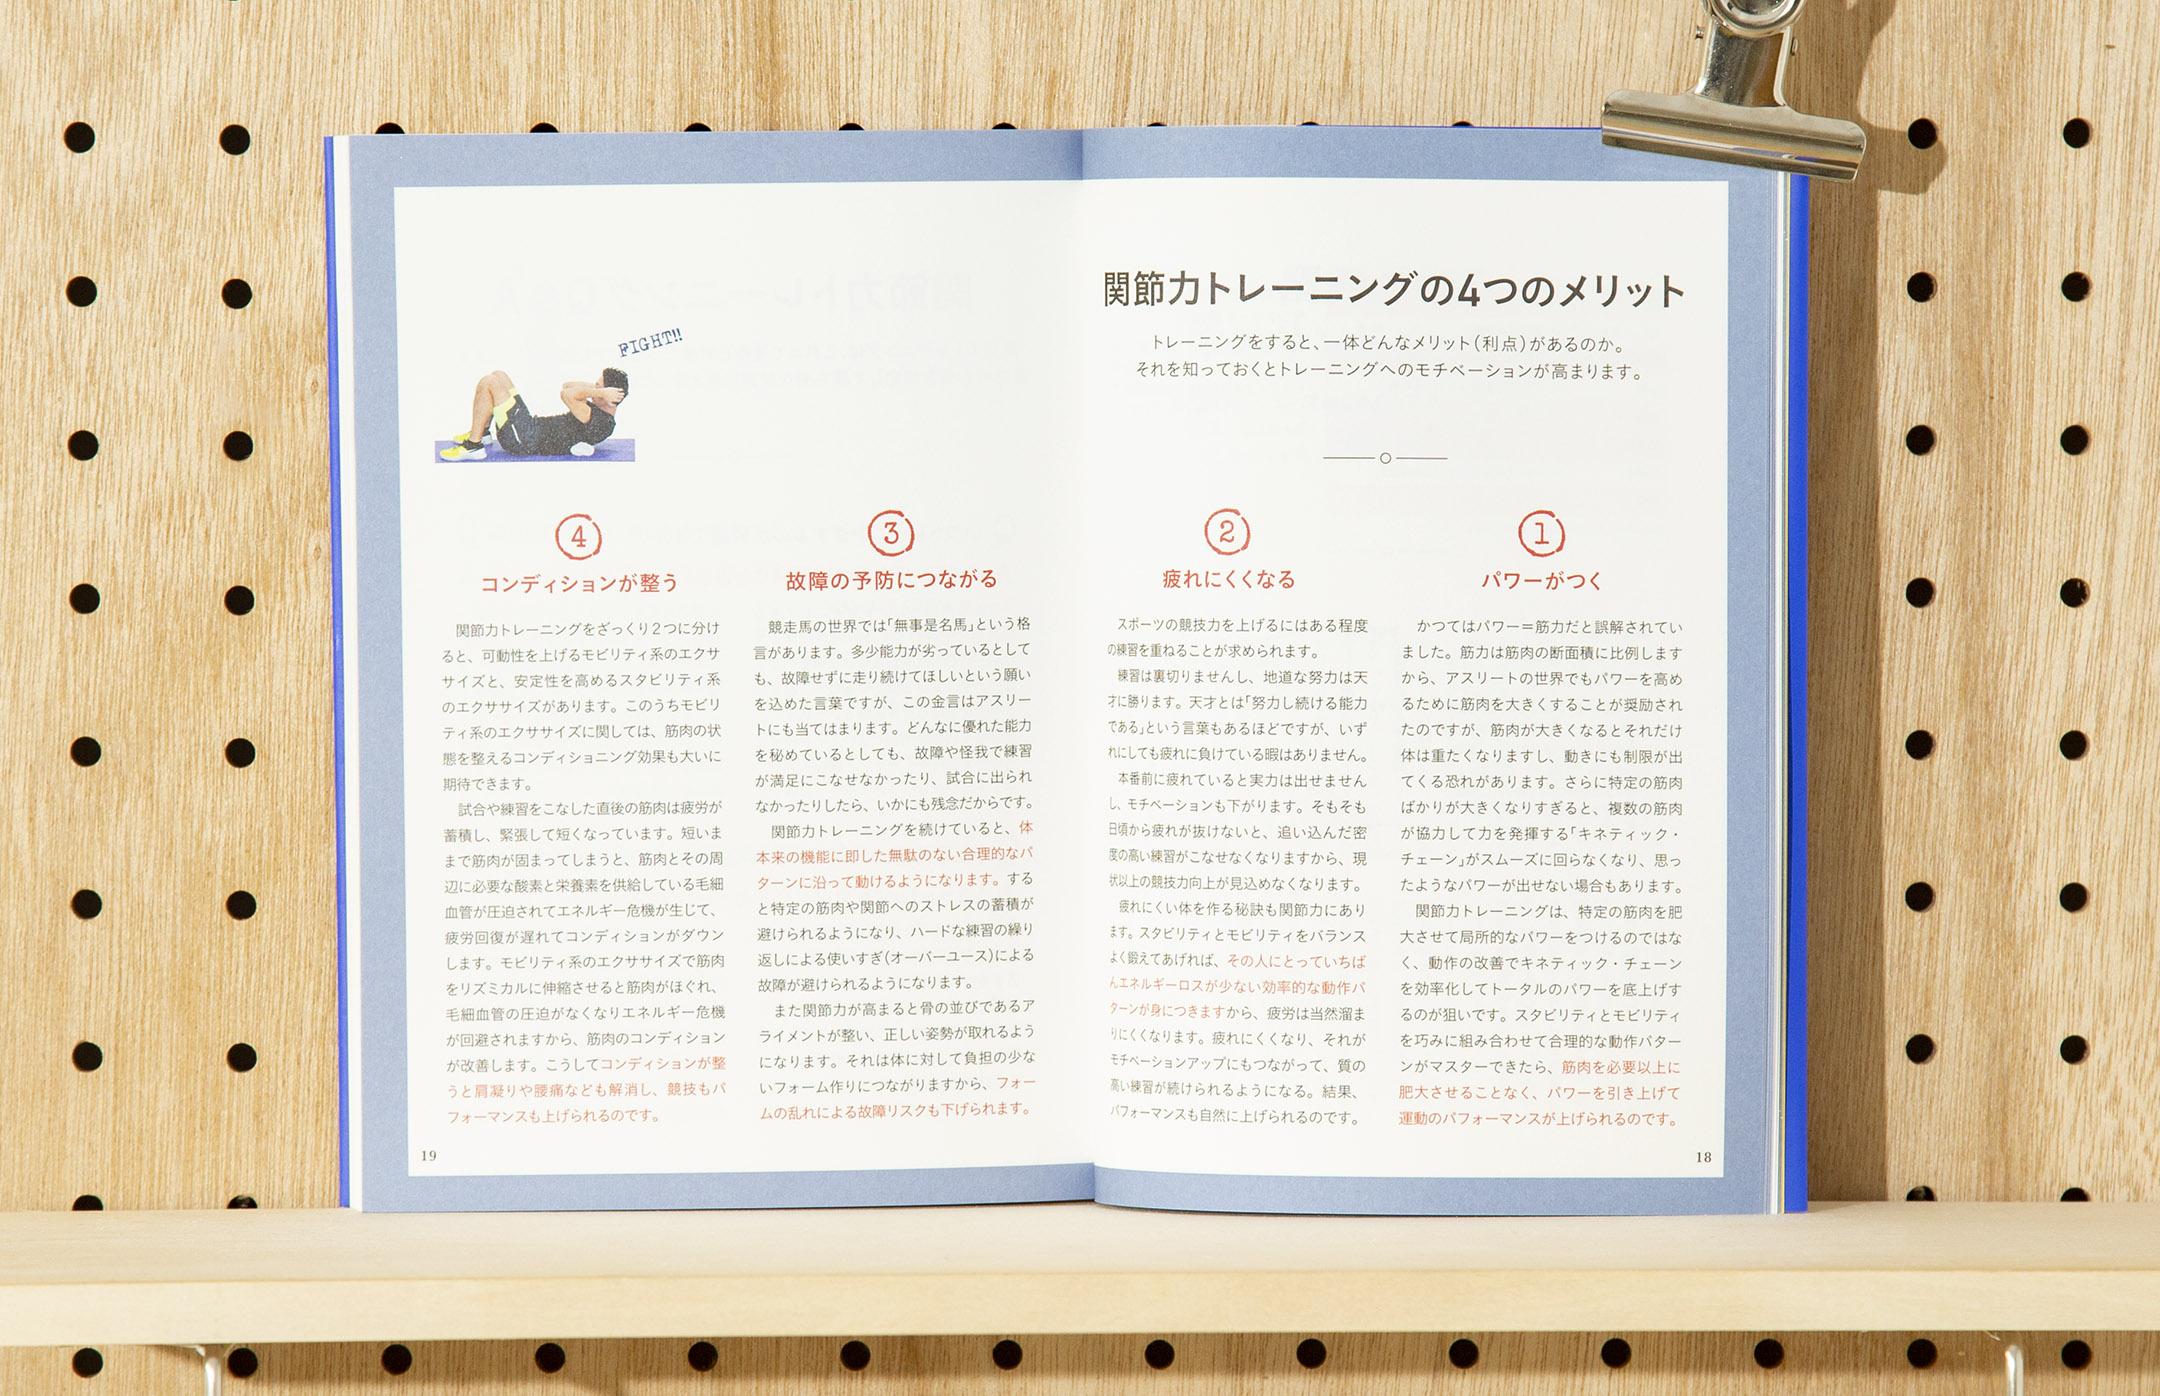 soda design 「関節力」トレーニング 前田健太 高梨沙羅 太田雄貴